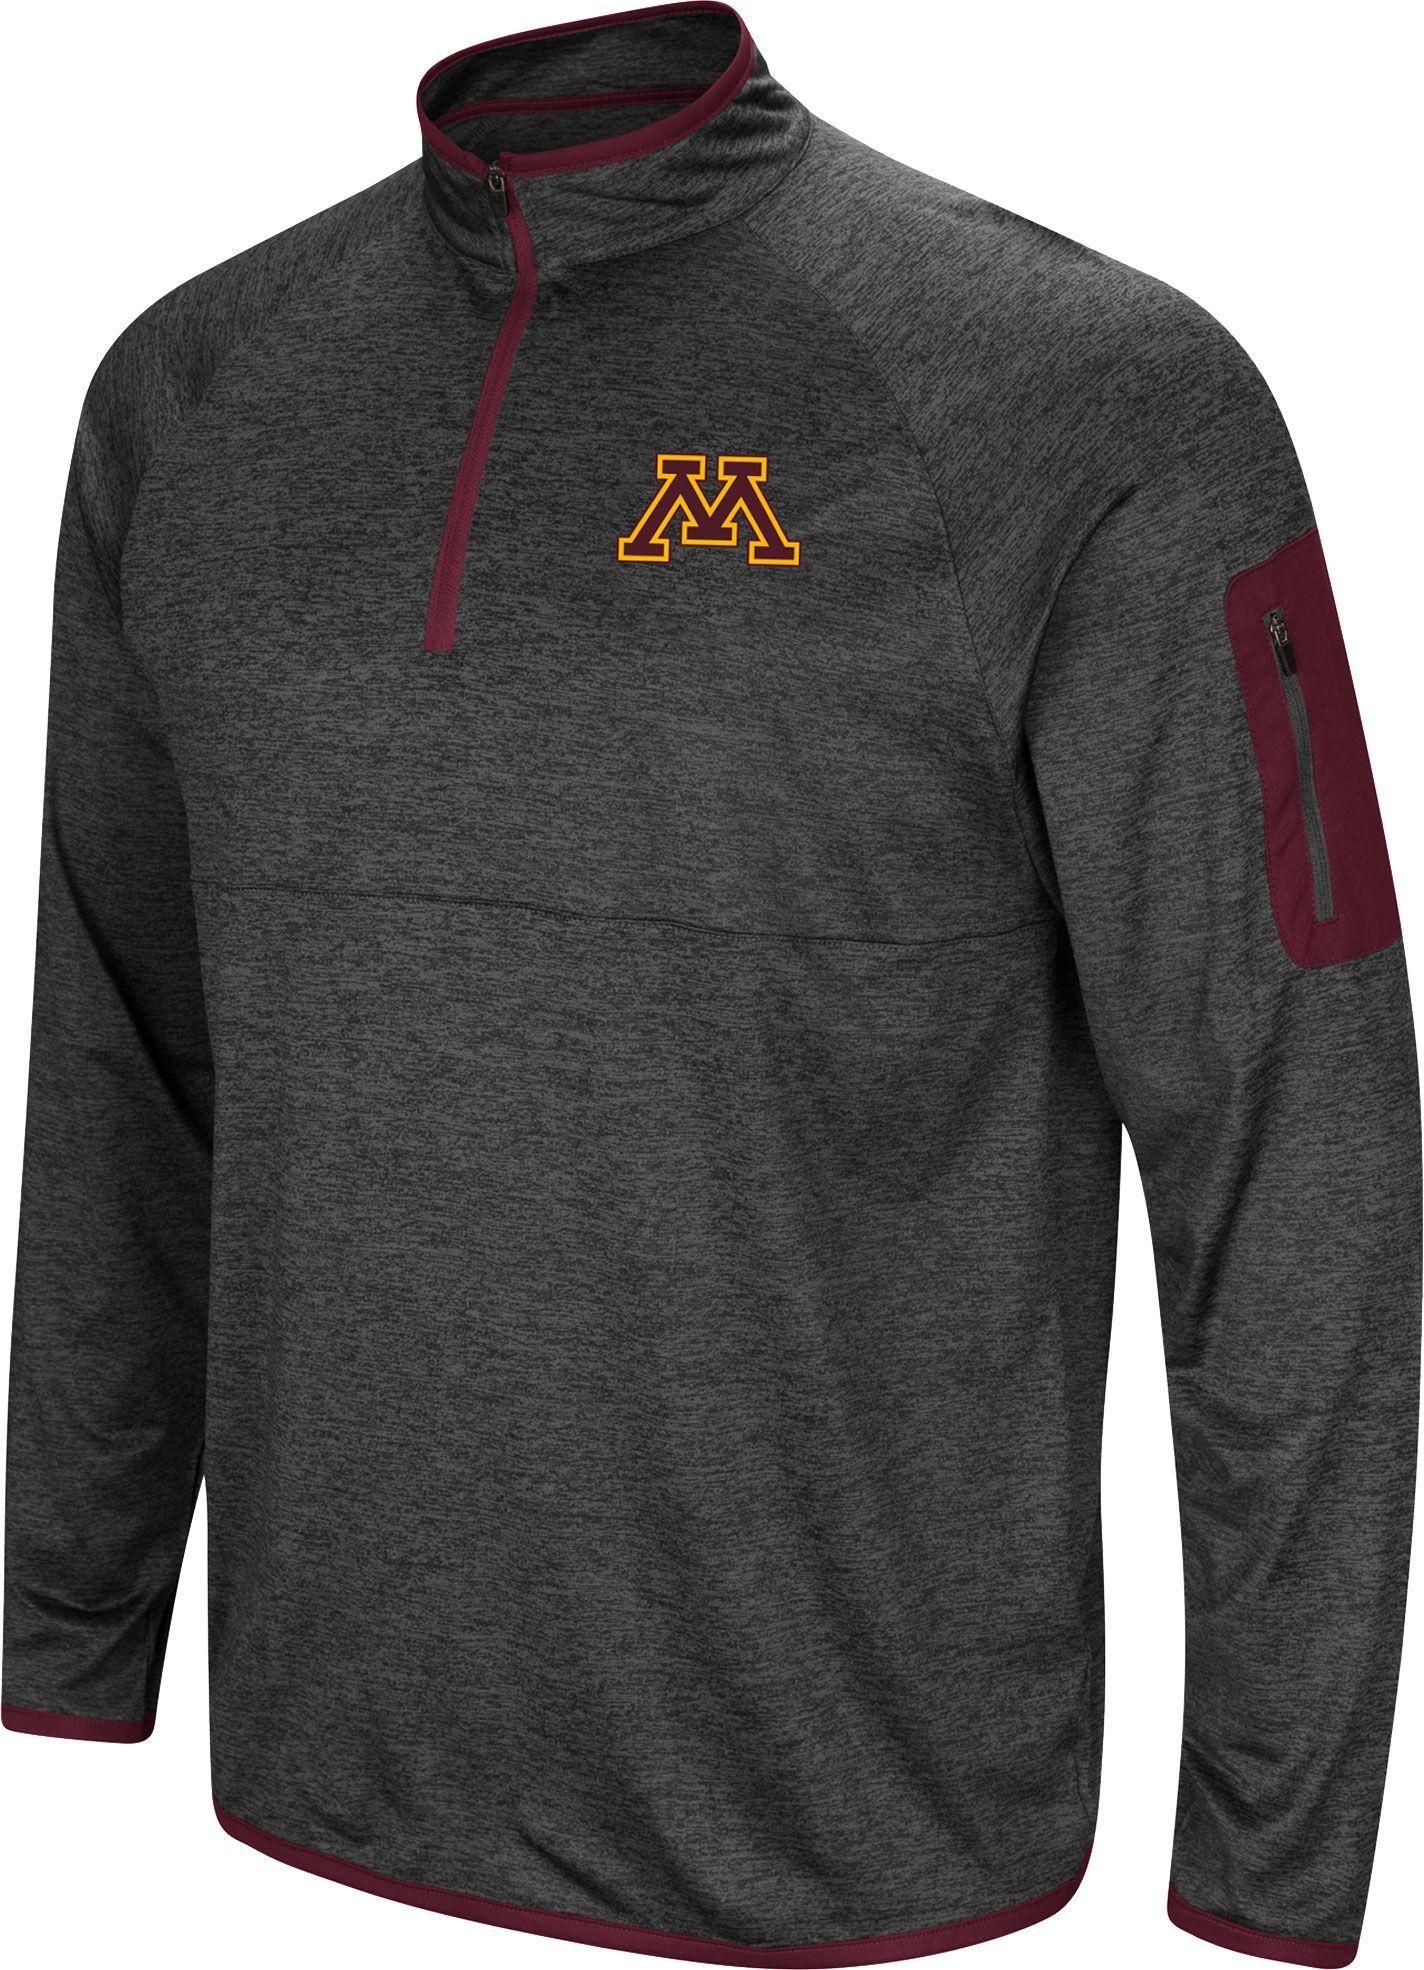 9e5784730 Colosseum Men's Minnesota Golden Gophers Grey Amnesia Quarter-Zip Shirt,  Gray